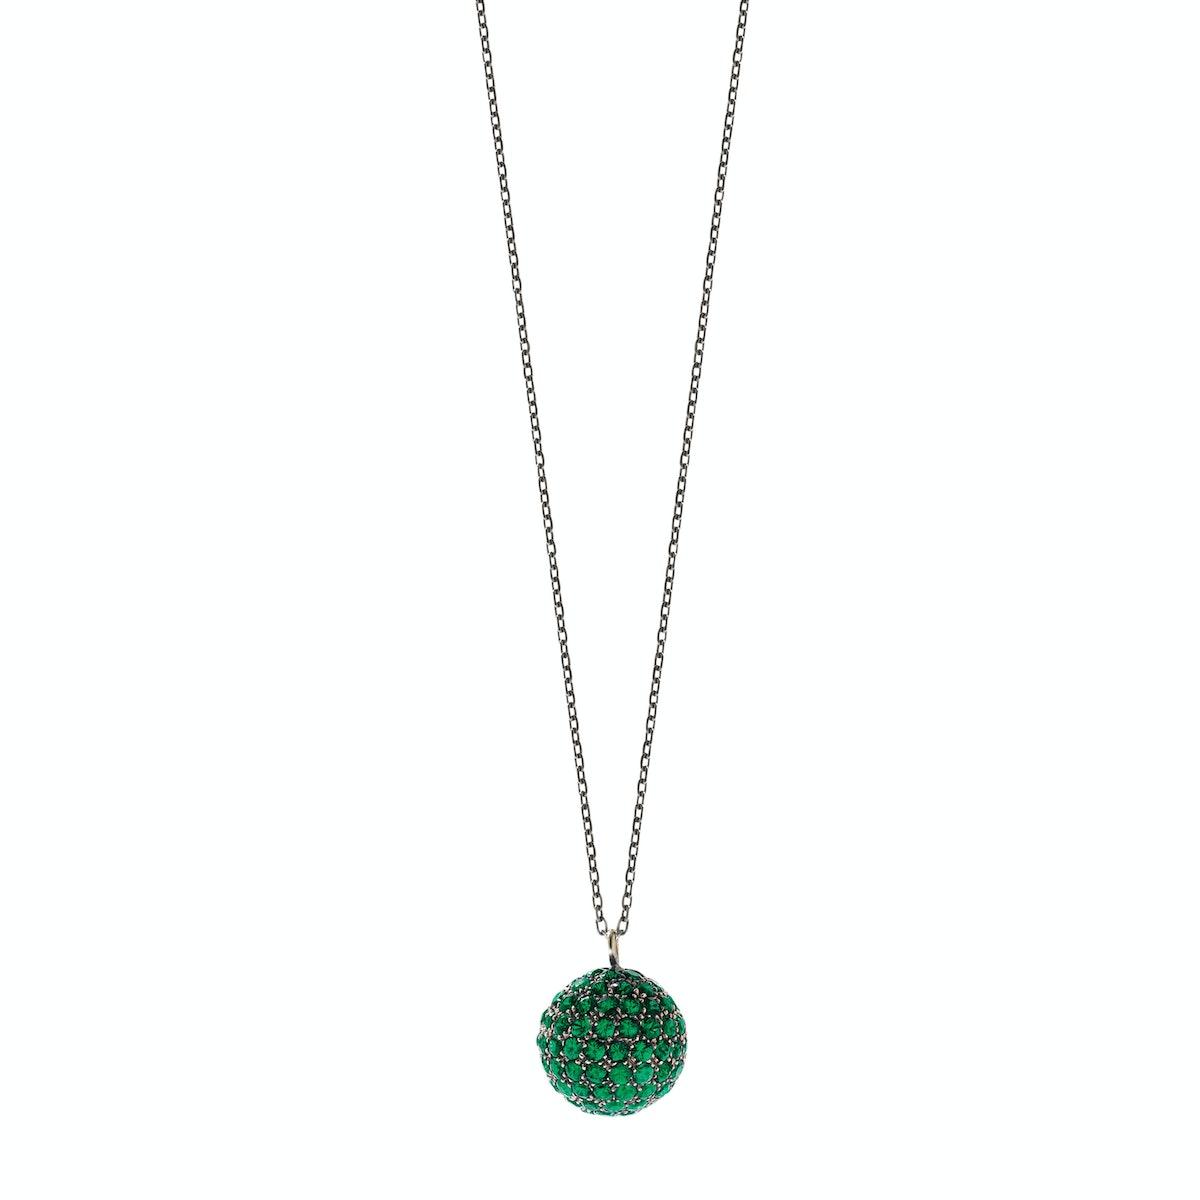 Solange Azagury Partridge necklace